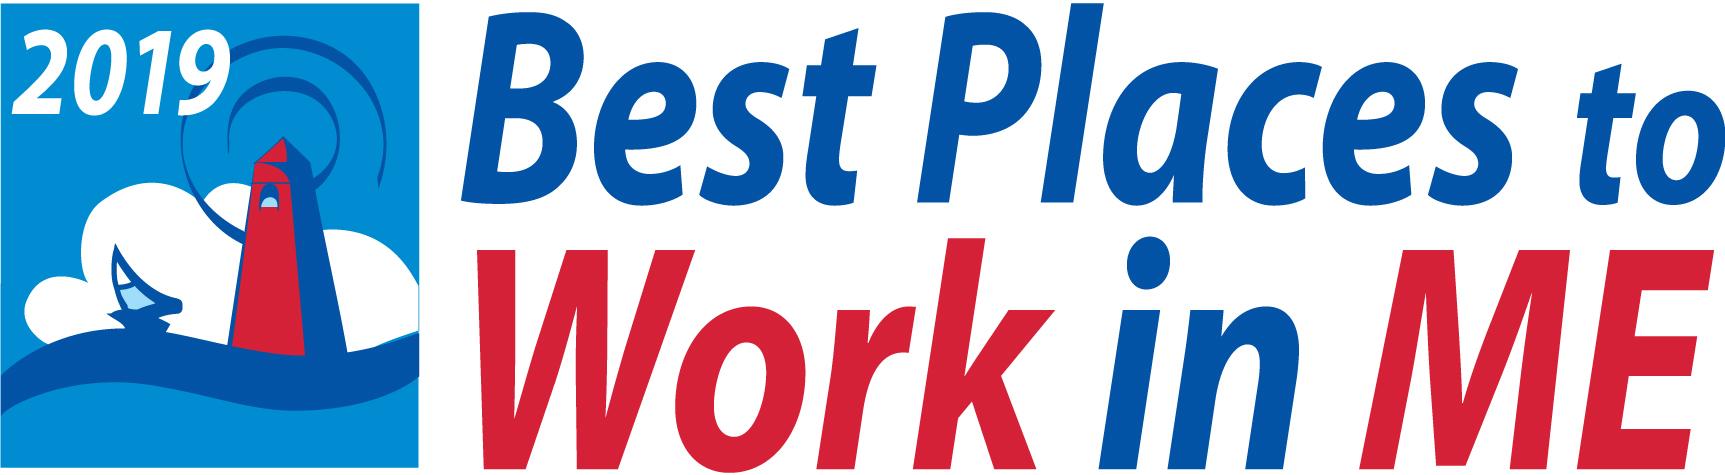 BPTW_Maine_2019_logo.jpg